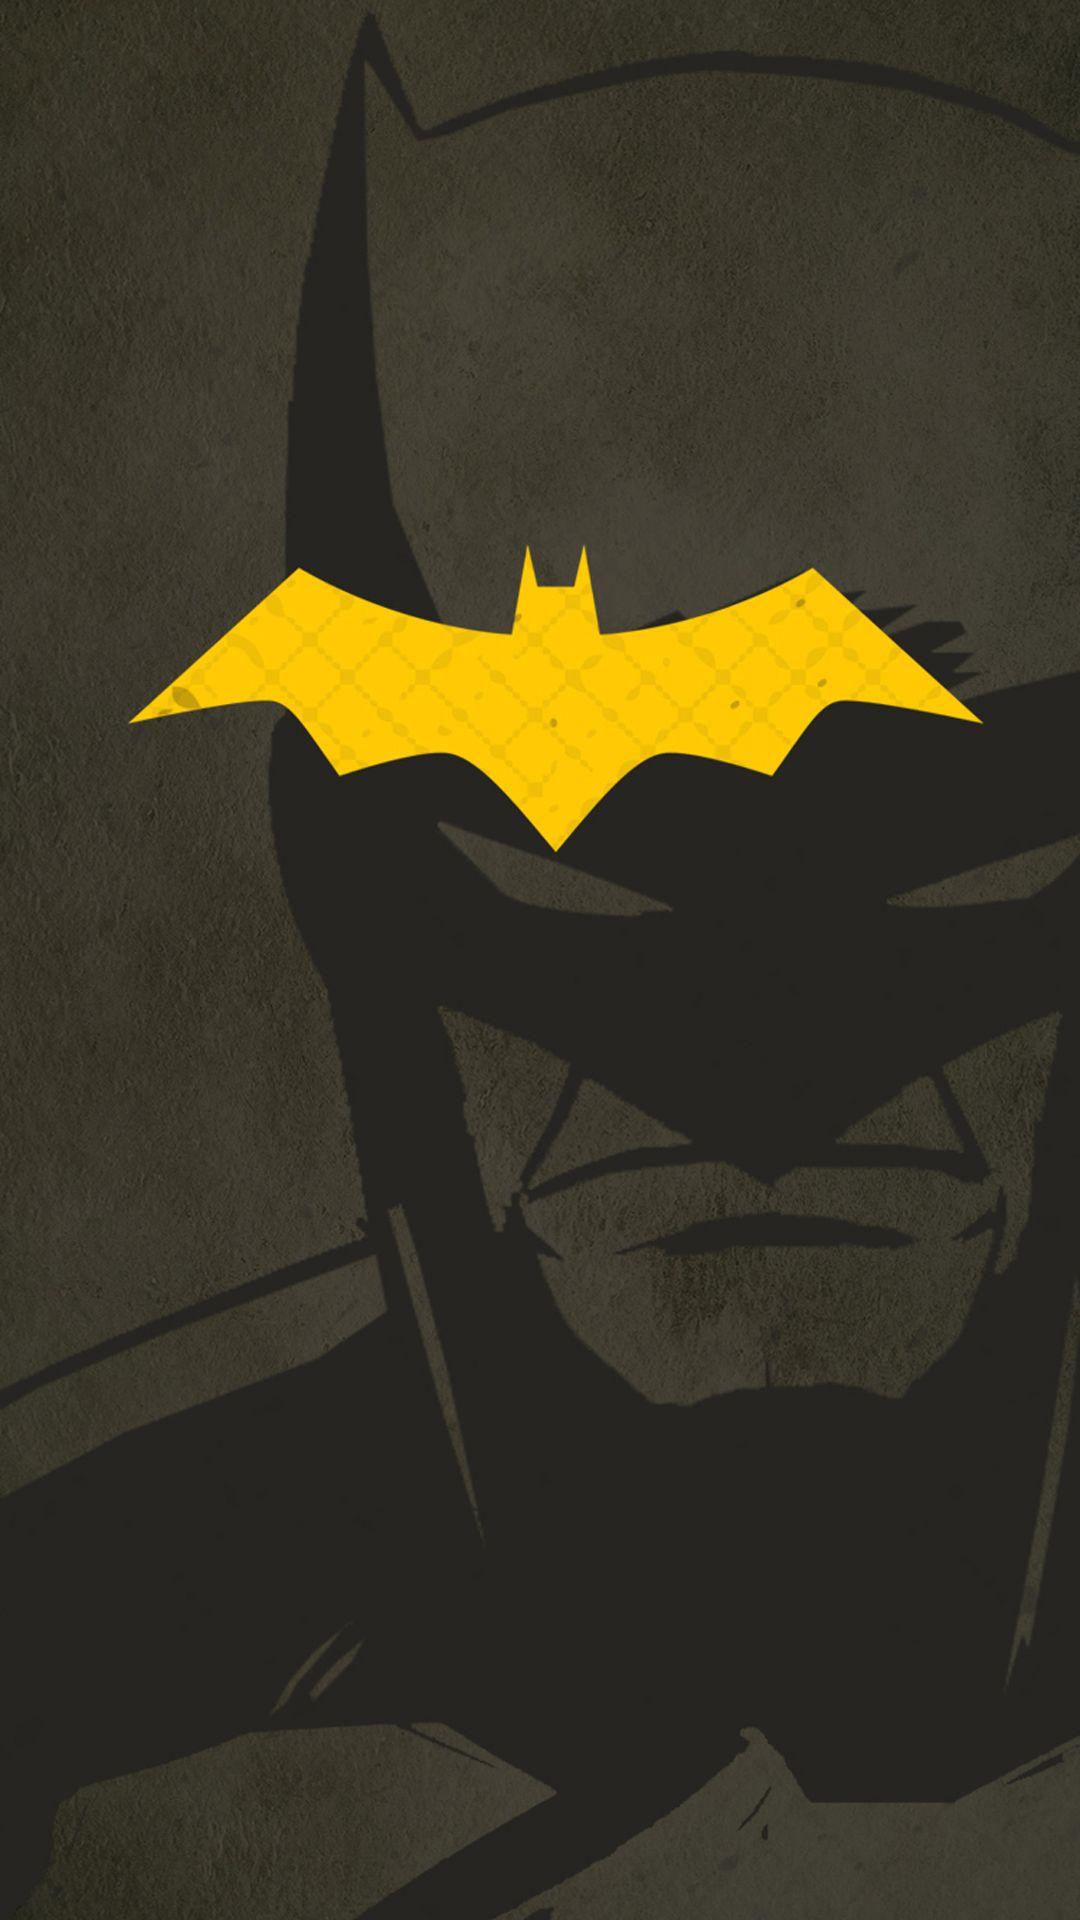 Batman 02 iPhone 6 Plus Visit to grab an amazing super